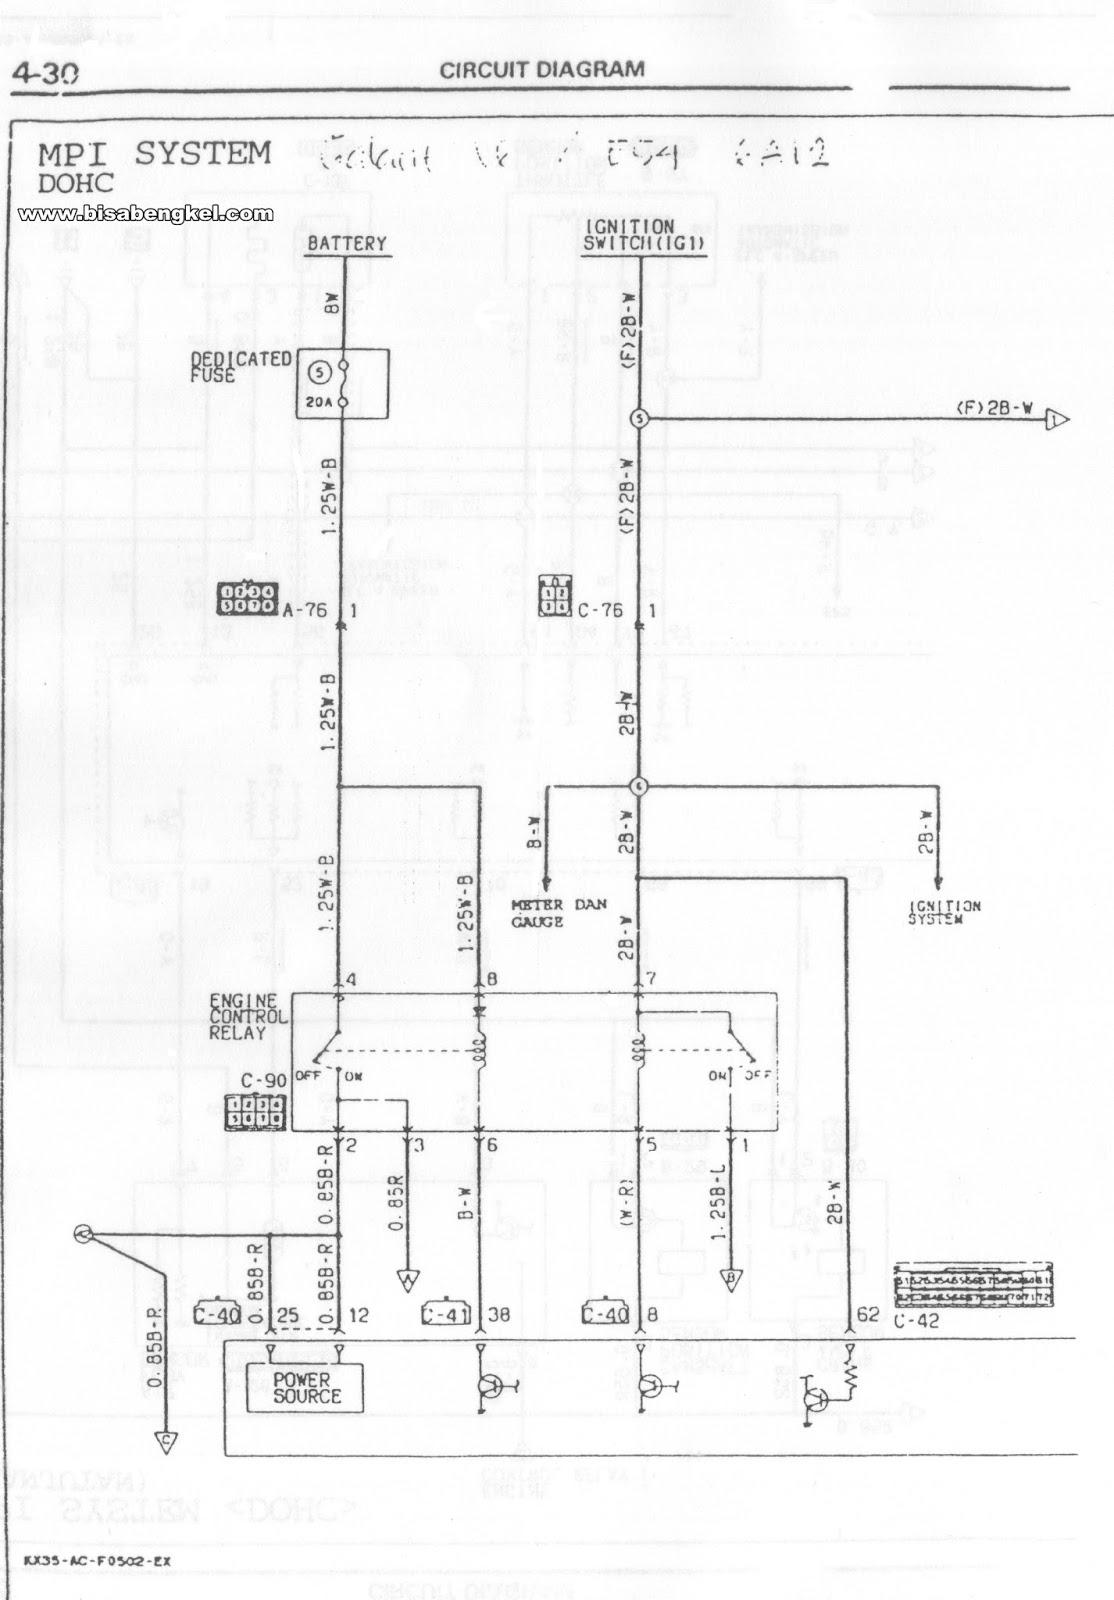 DIAGRAM KELISTRIKAN POWER SUPPLY MITSUBISHI GALANT V6 GALANT